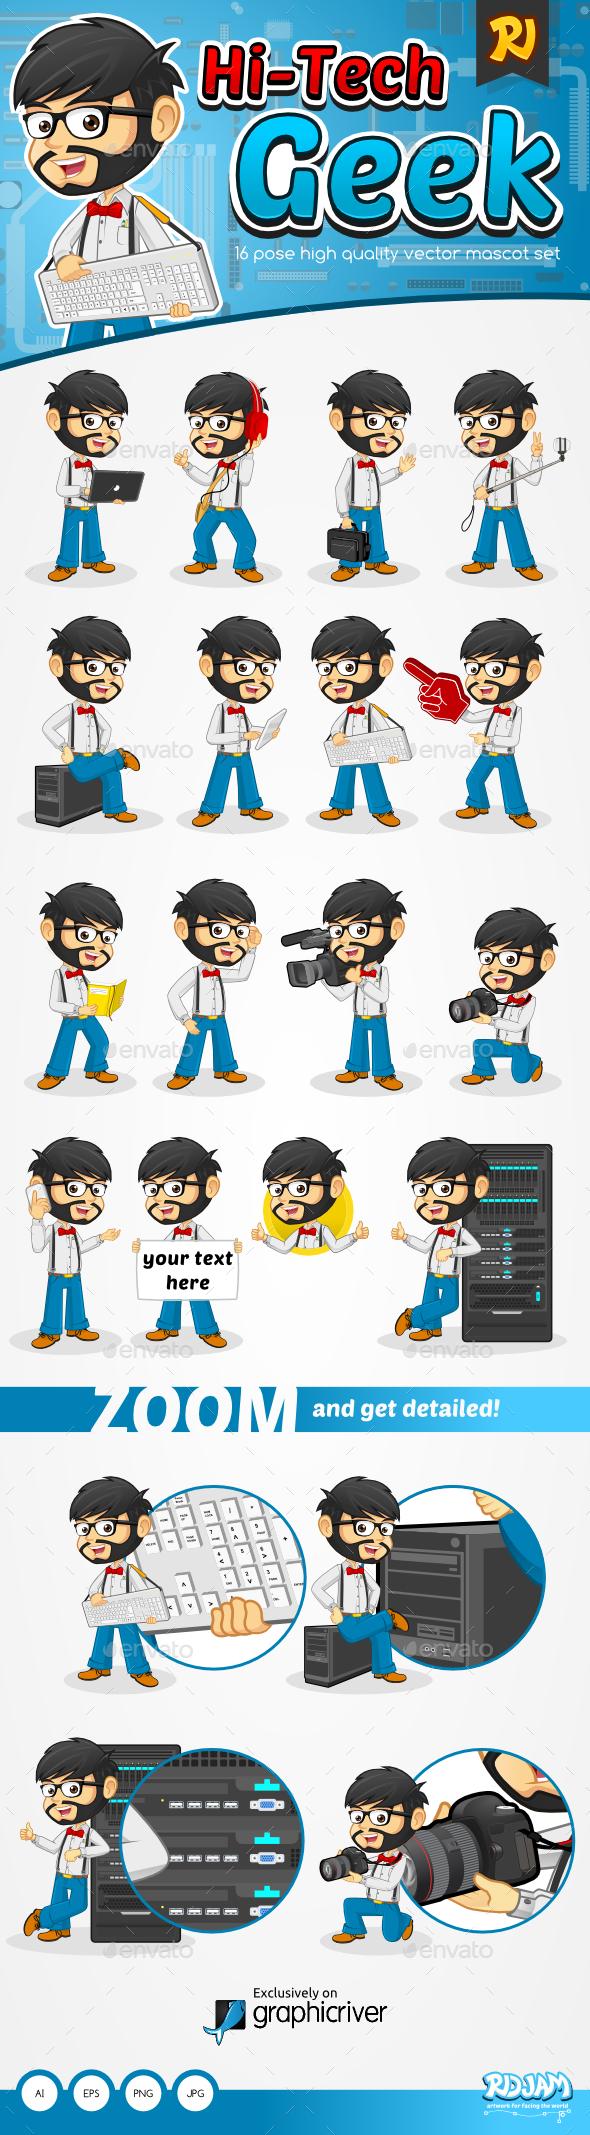 GraphicRiver Hi-Tech Geek 9469977